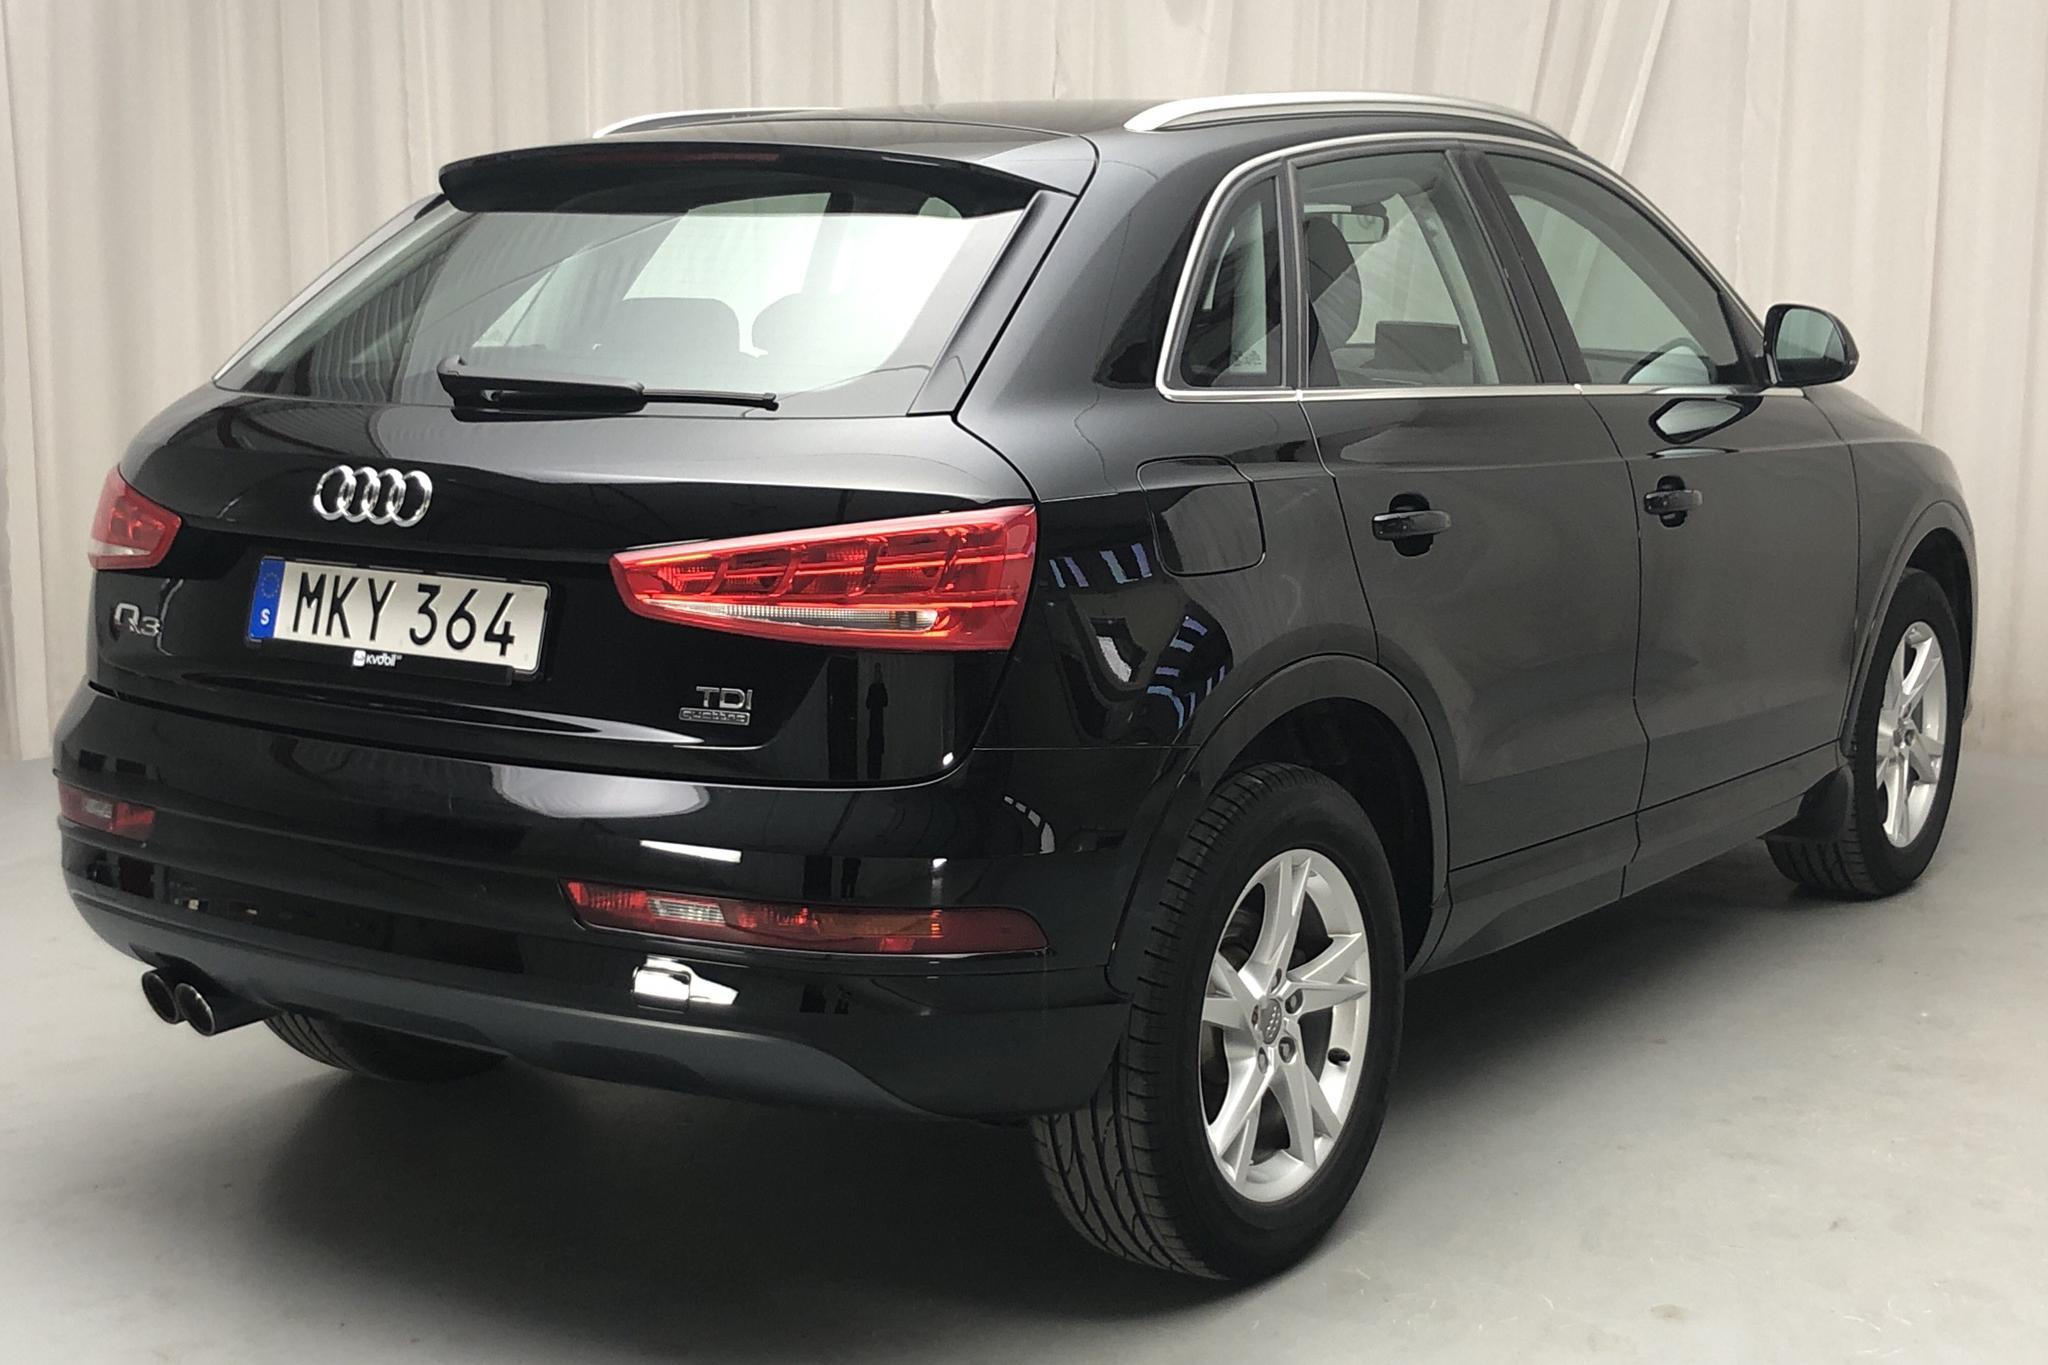 Audi Q3 2.0 TDI quattro (150hk) - 51 090 km - Manual - black - 2018